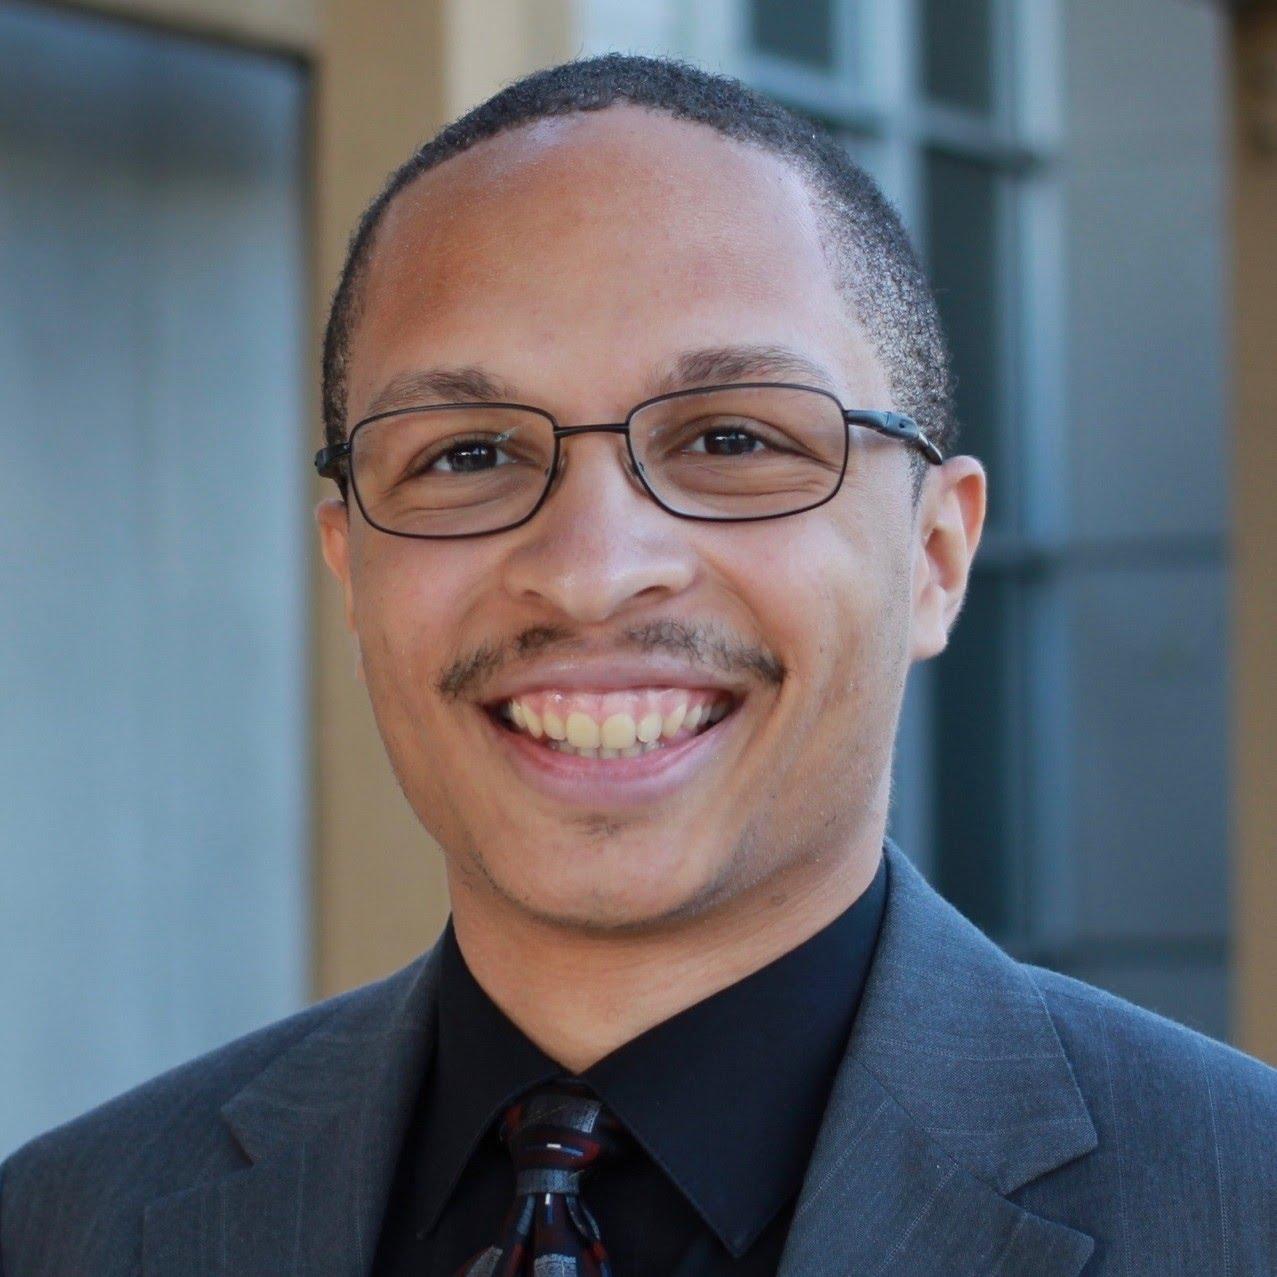 Google Student Blog: My Path to Google: William Edward